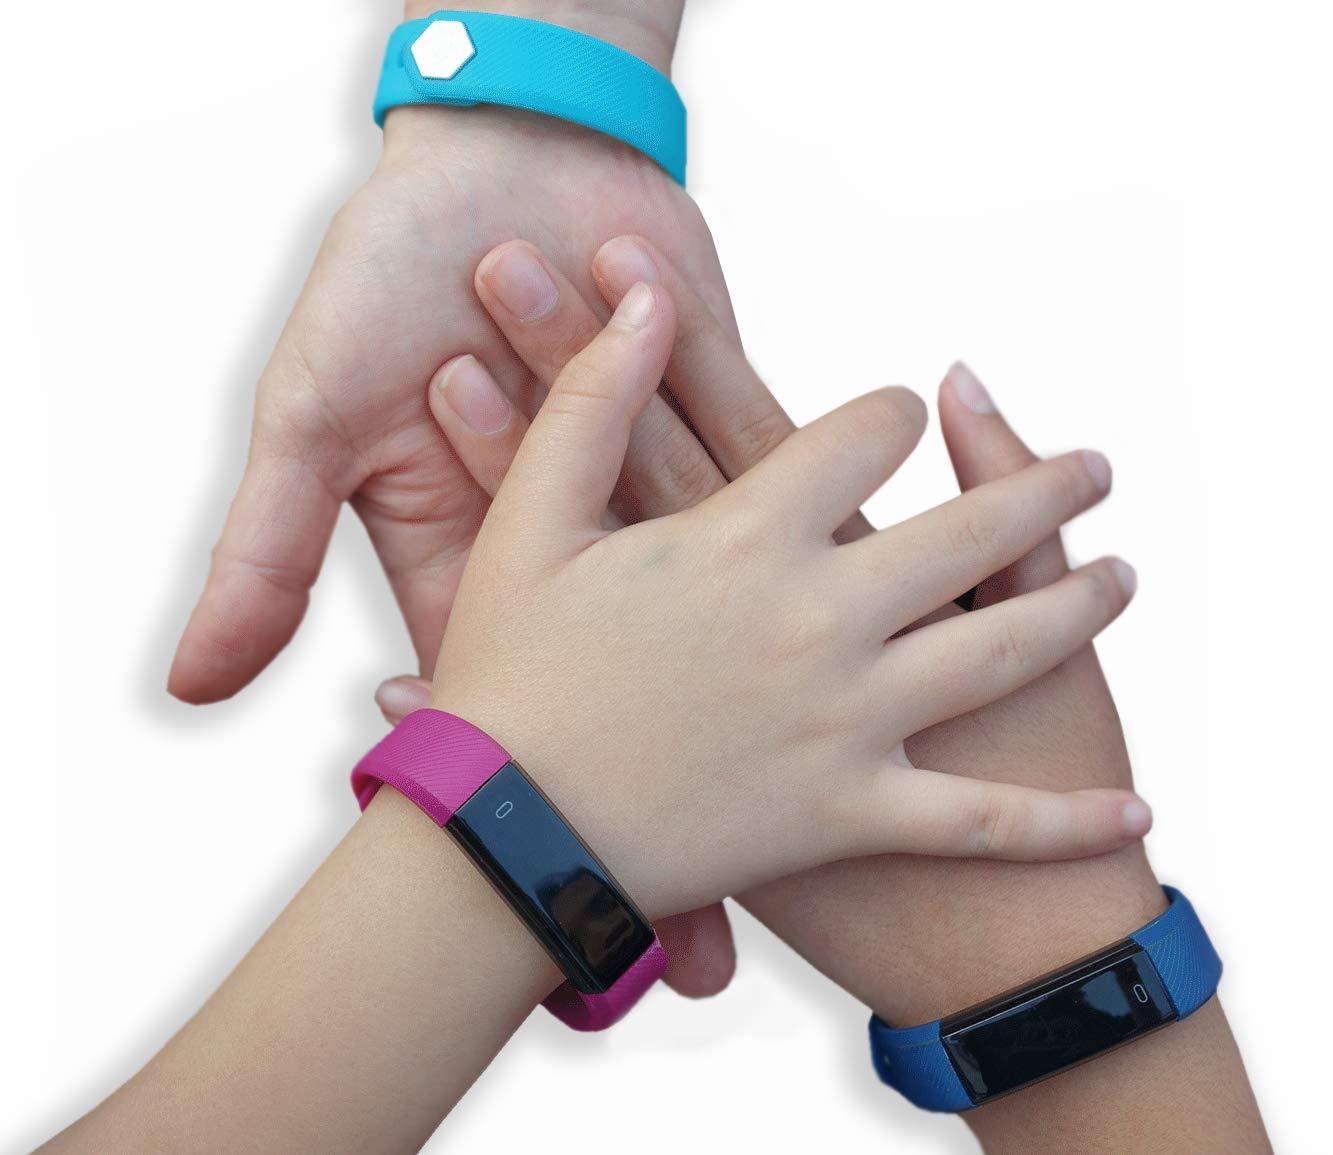 Kids Fitness Tracker for Kids Activity Tracker – Smart Watch for Boys Girls Teens Youth Digital Step Counter Sleep…